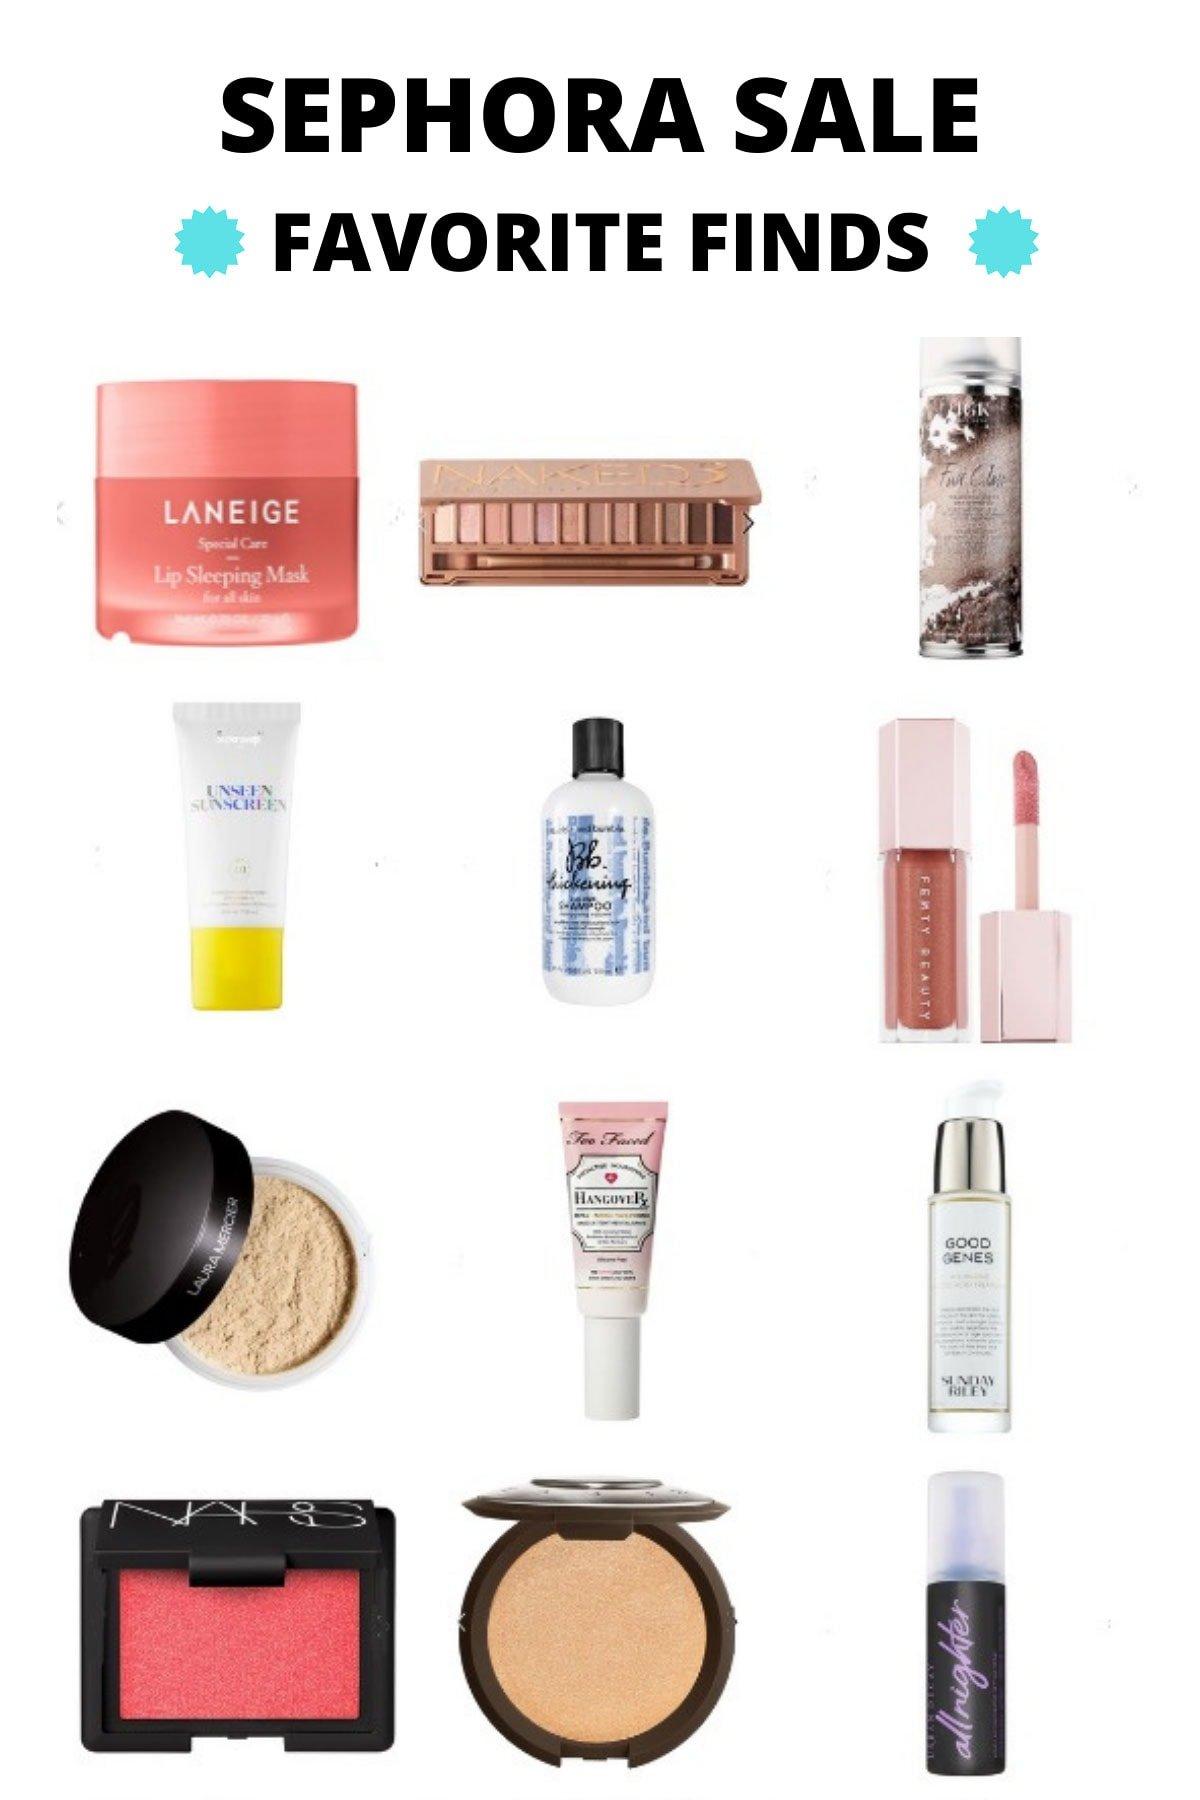 Un collage de objetos de Sephora